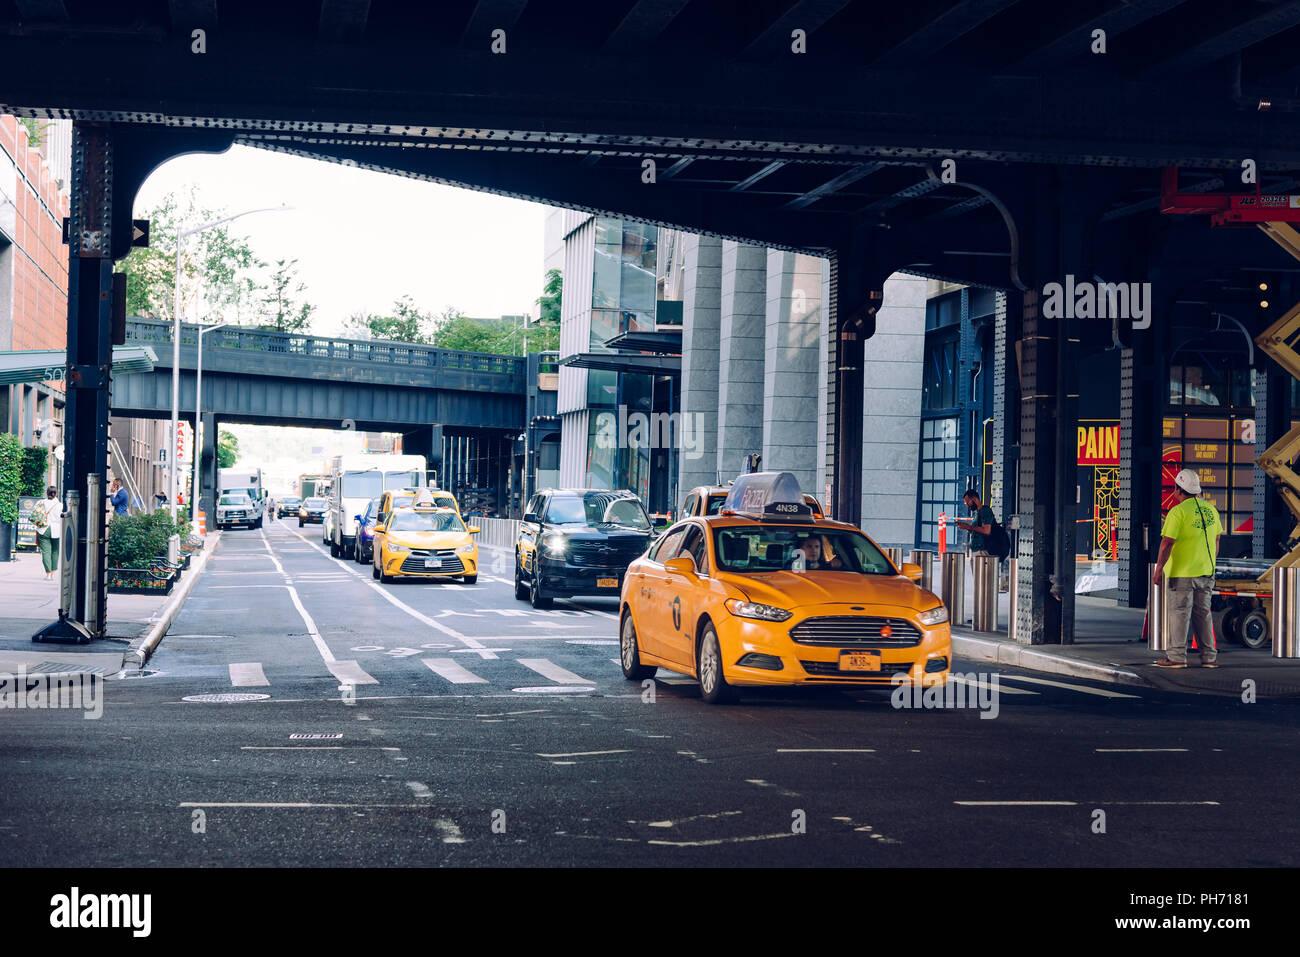 New York City, USA - June 22, 2018: Yellow taxi cab traveling under High Line bridge in Manhattan Stock Photo